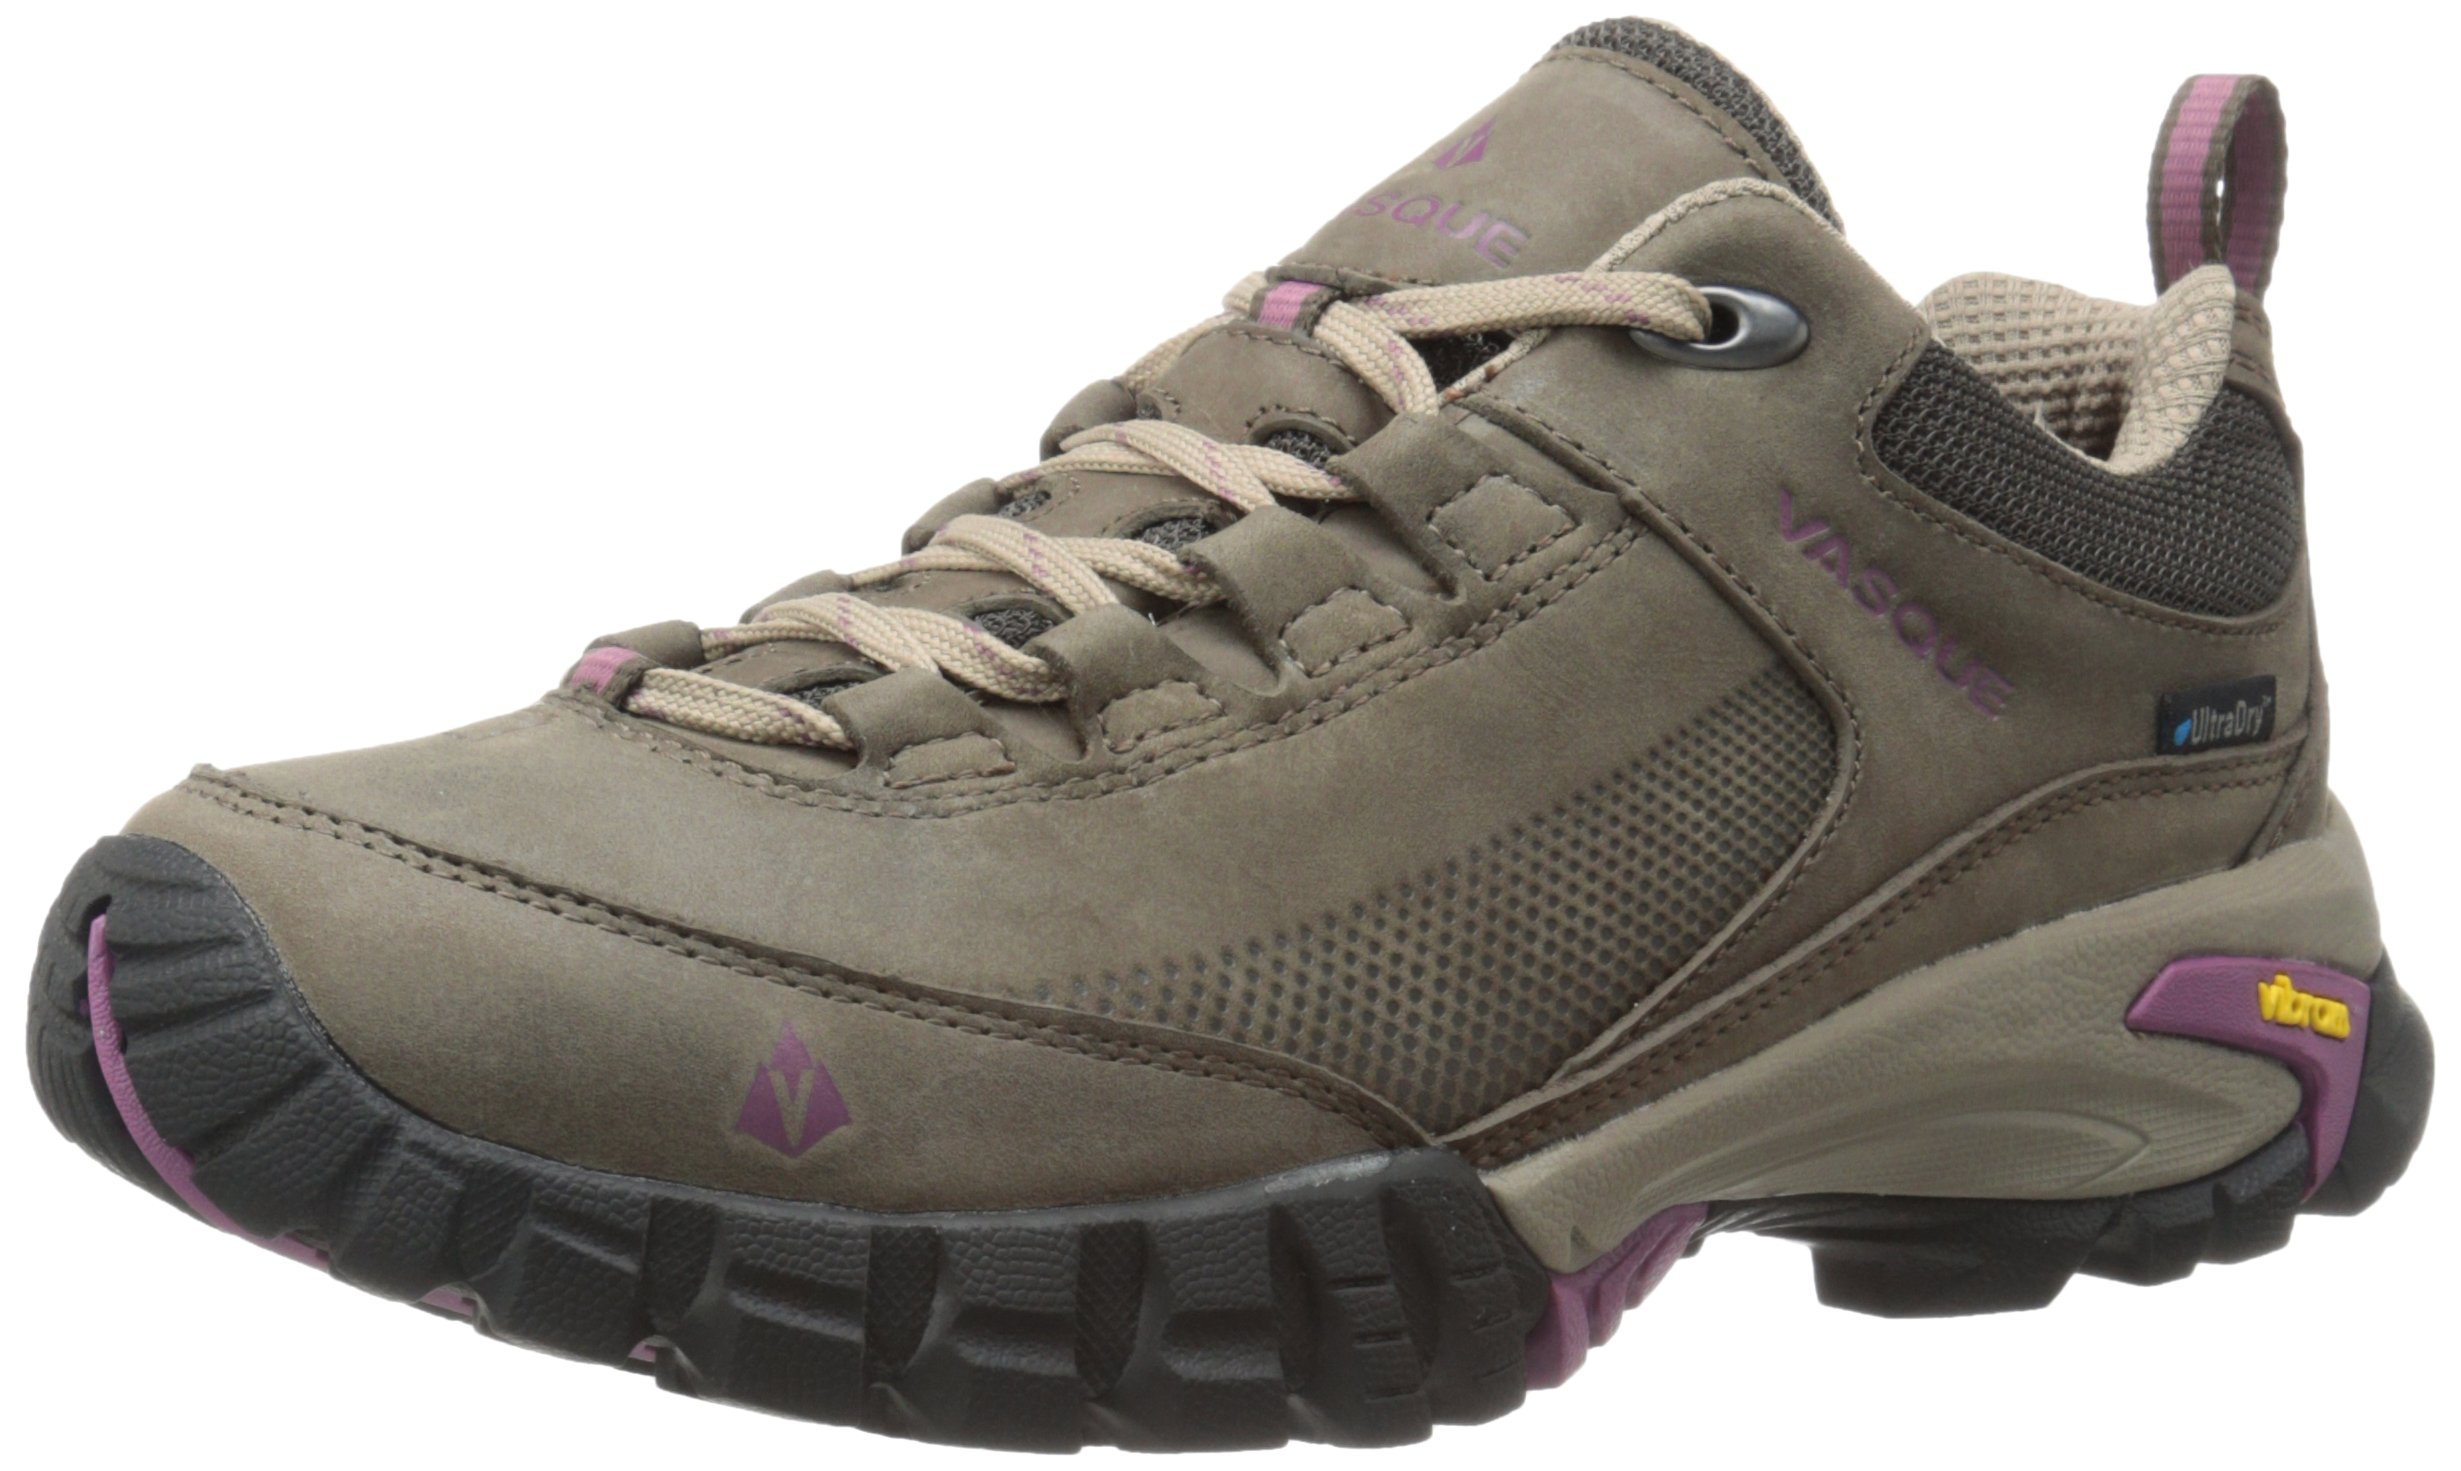 Vasque Women's Talus Trek Low UltraDry Hiking Shoe, Black Olive/Damson, 8.5 M US by Vasque (Image #1)